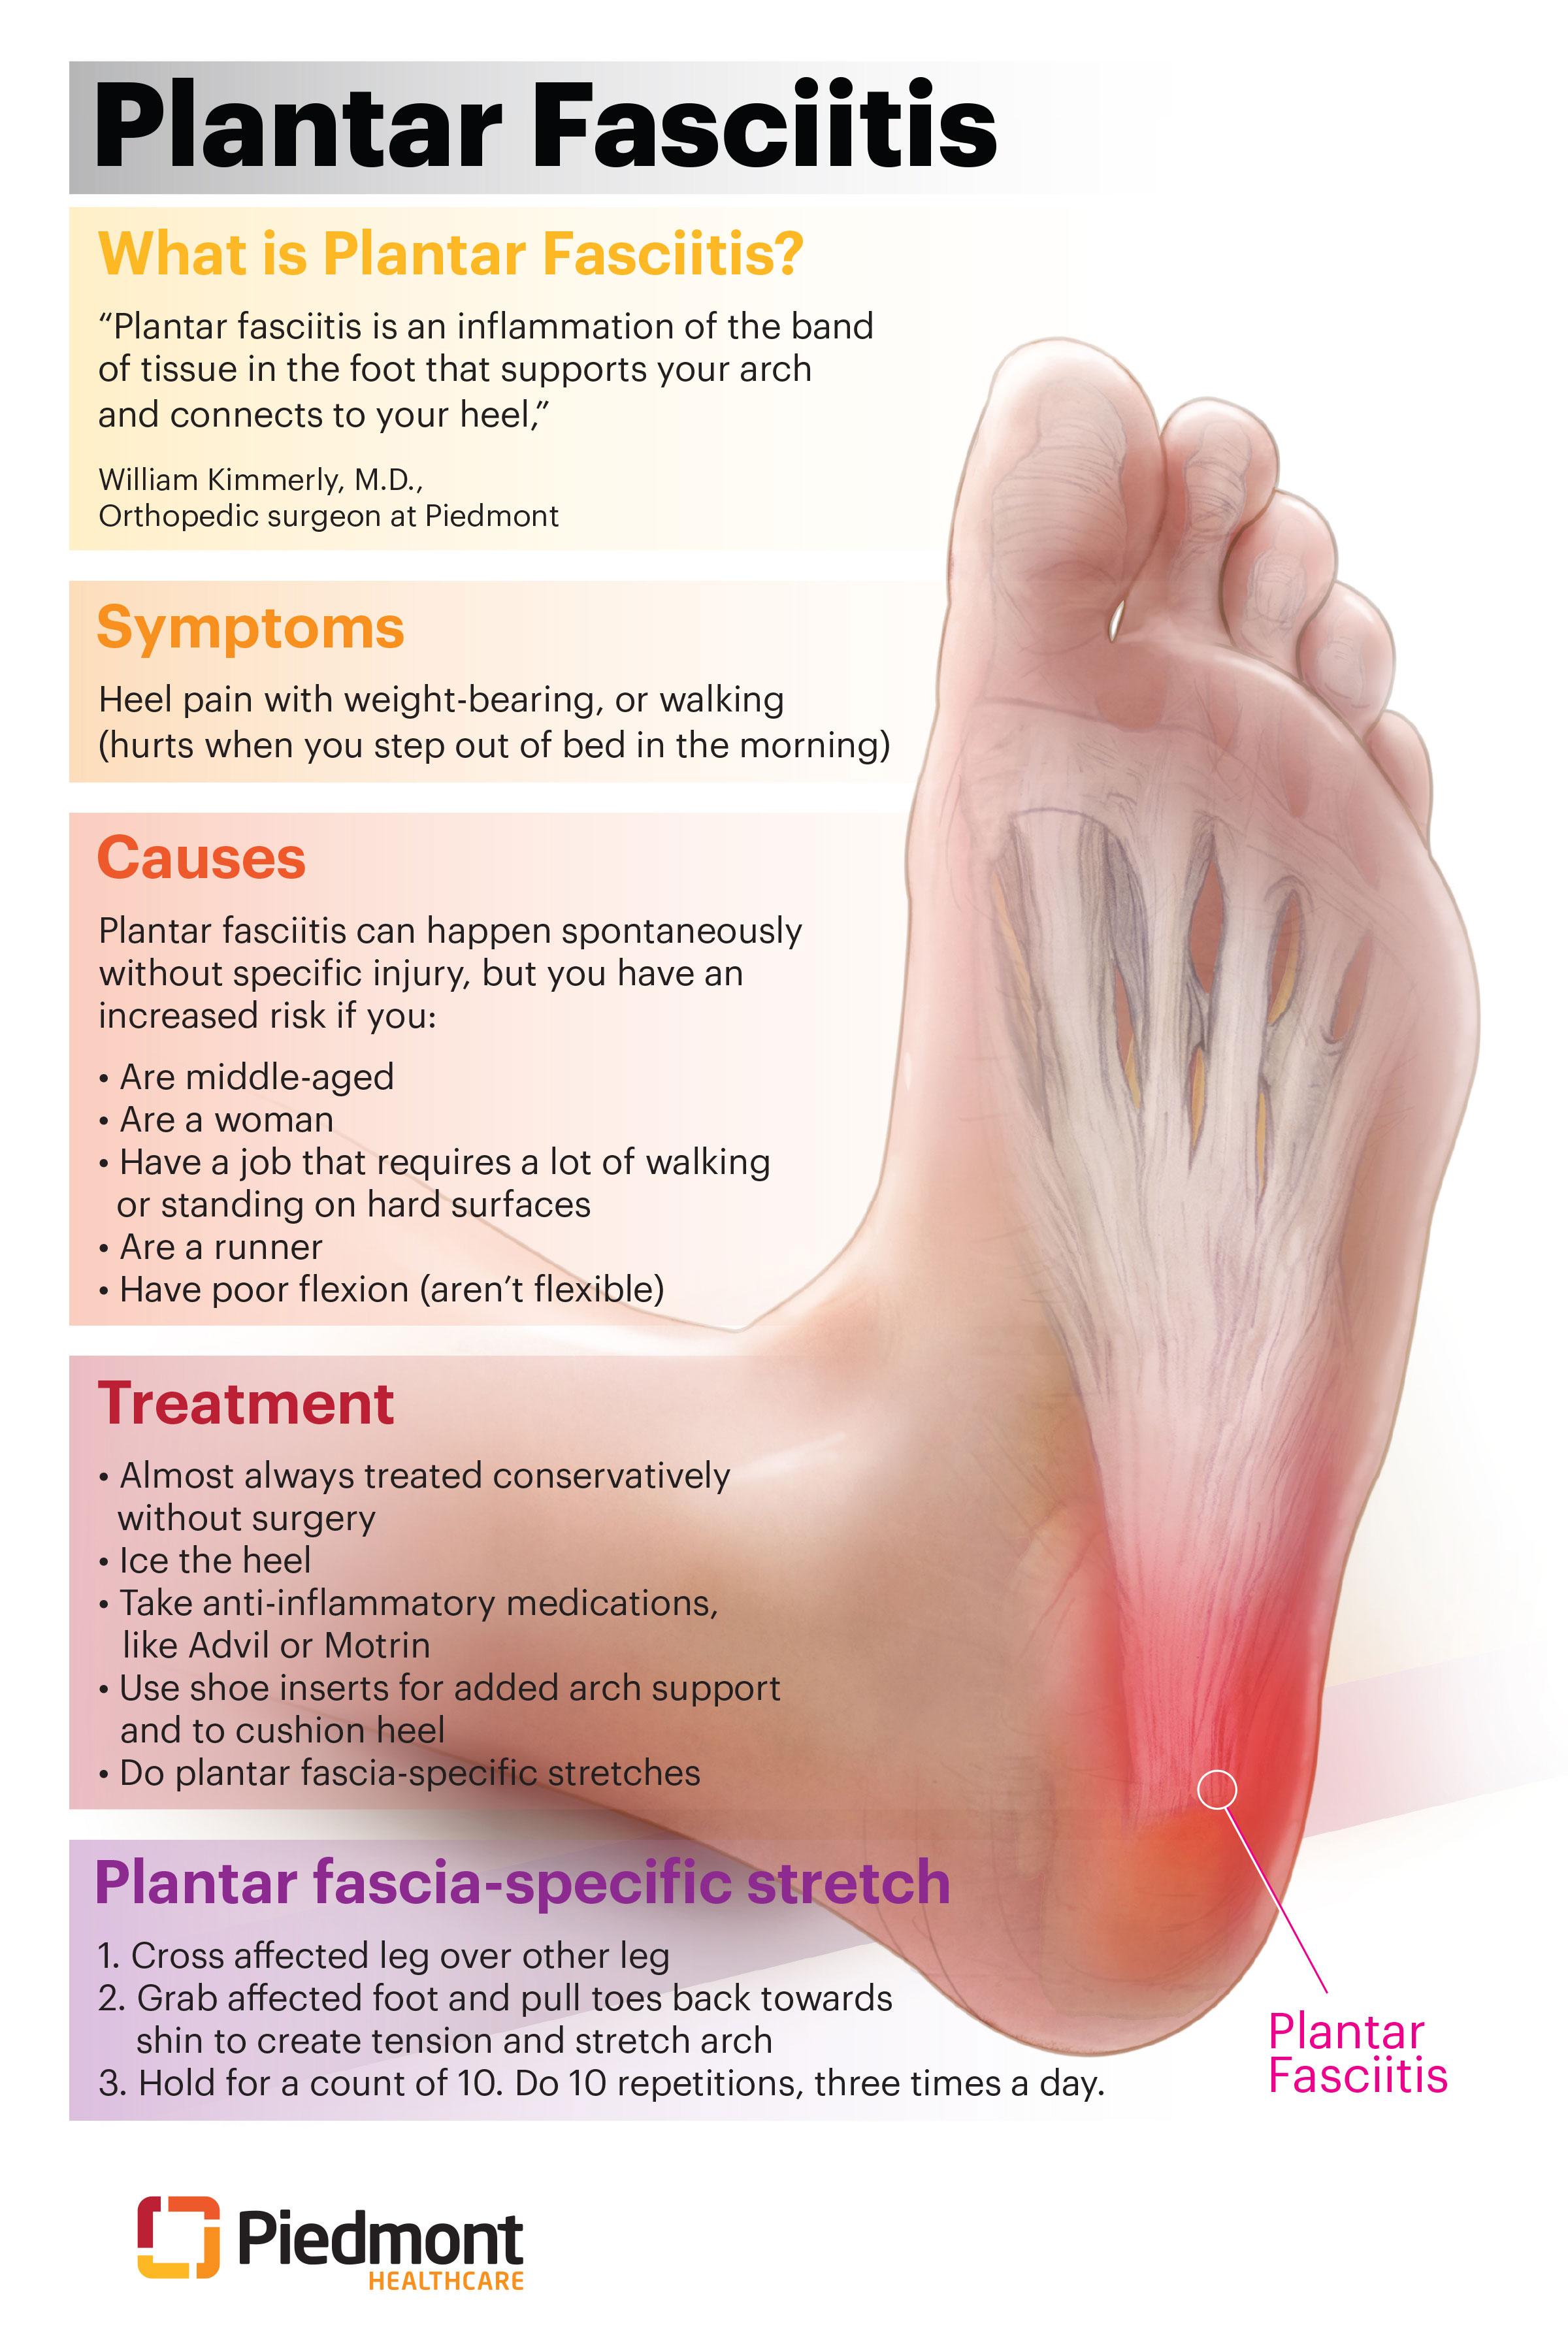 Plantar Fasciitis Symptoms and